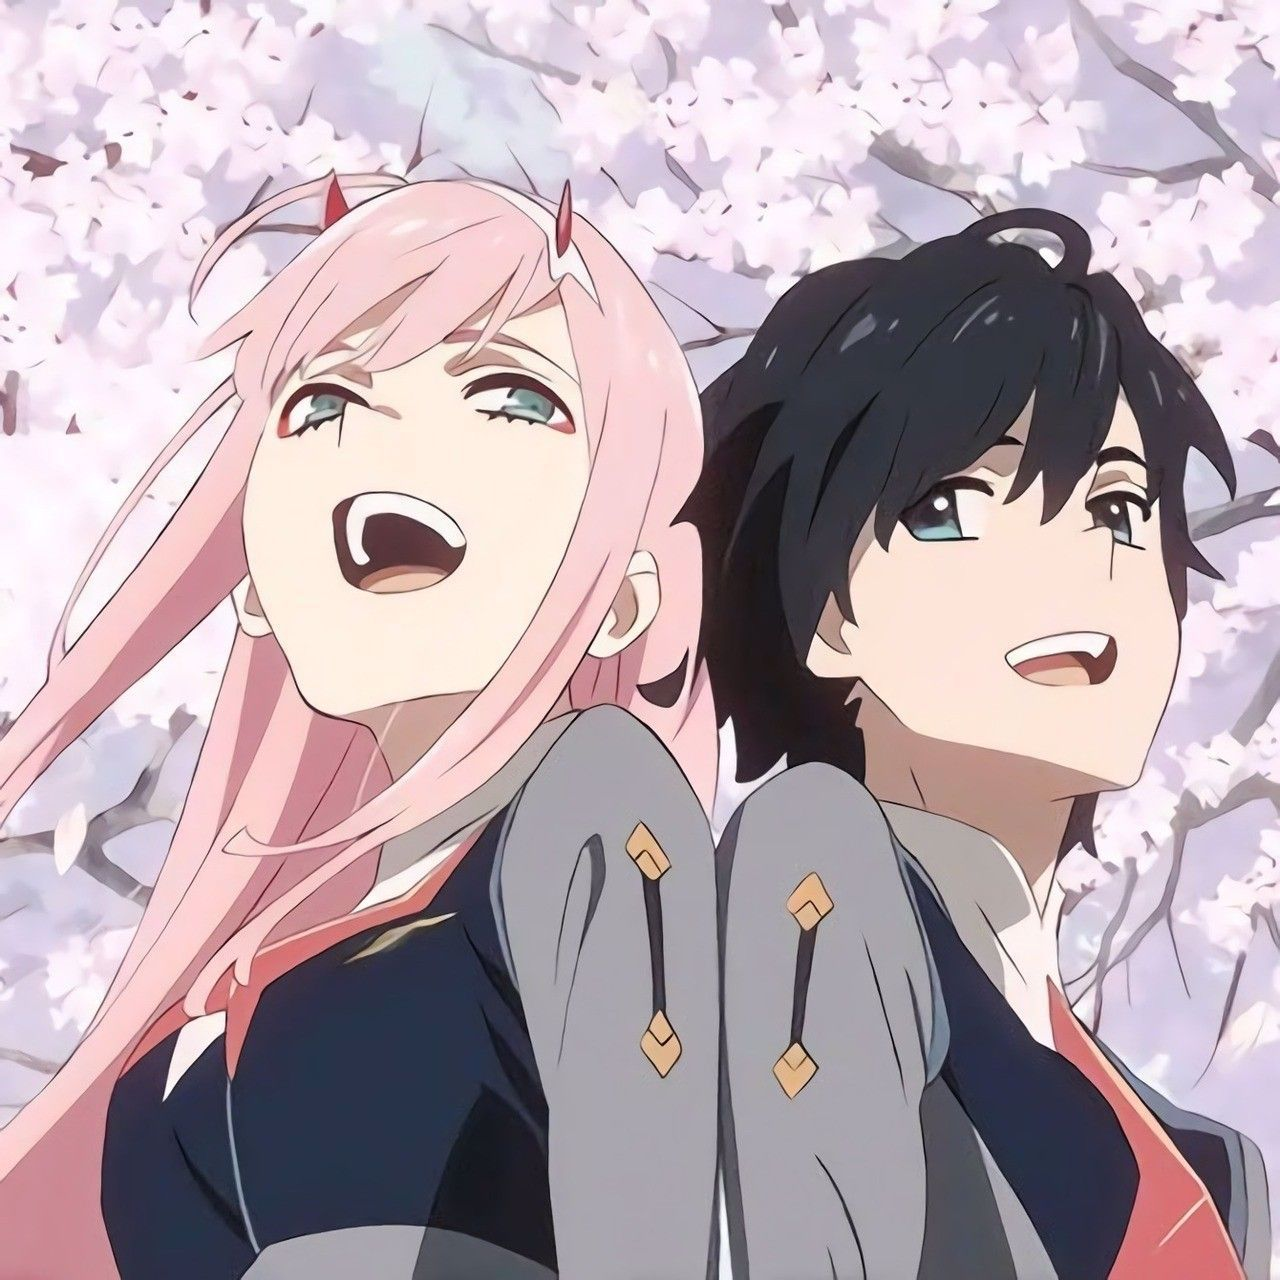 Zero Two Darling In The Franxx Darlinginthefranxx Zerotwo Manga Anime Gg In 2020 Darling In The Franxx Anime Anime Romance